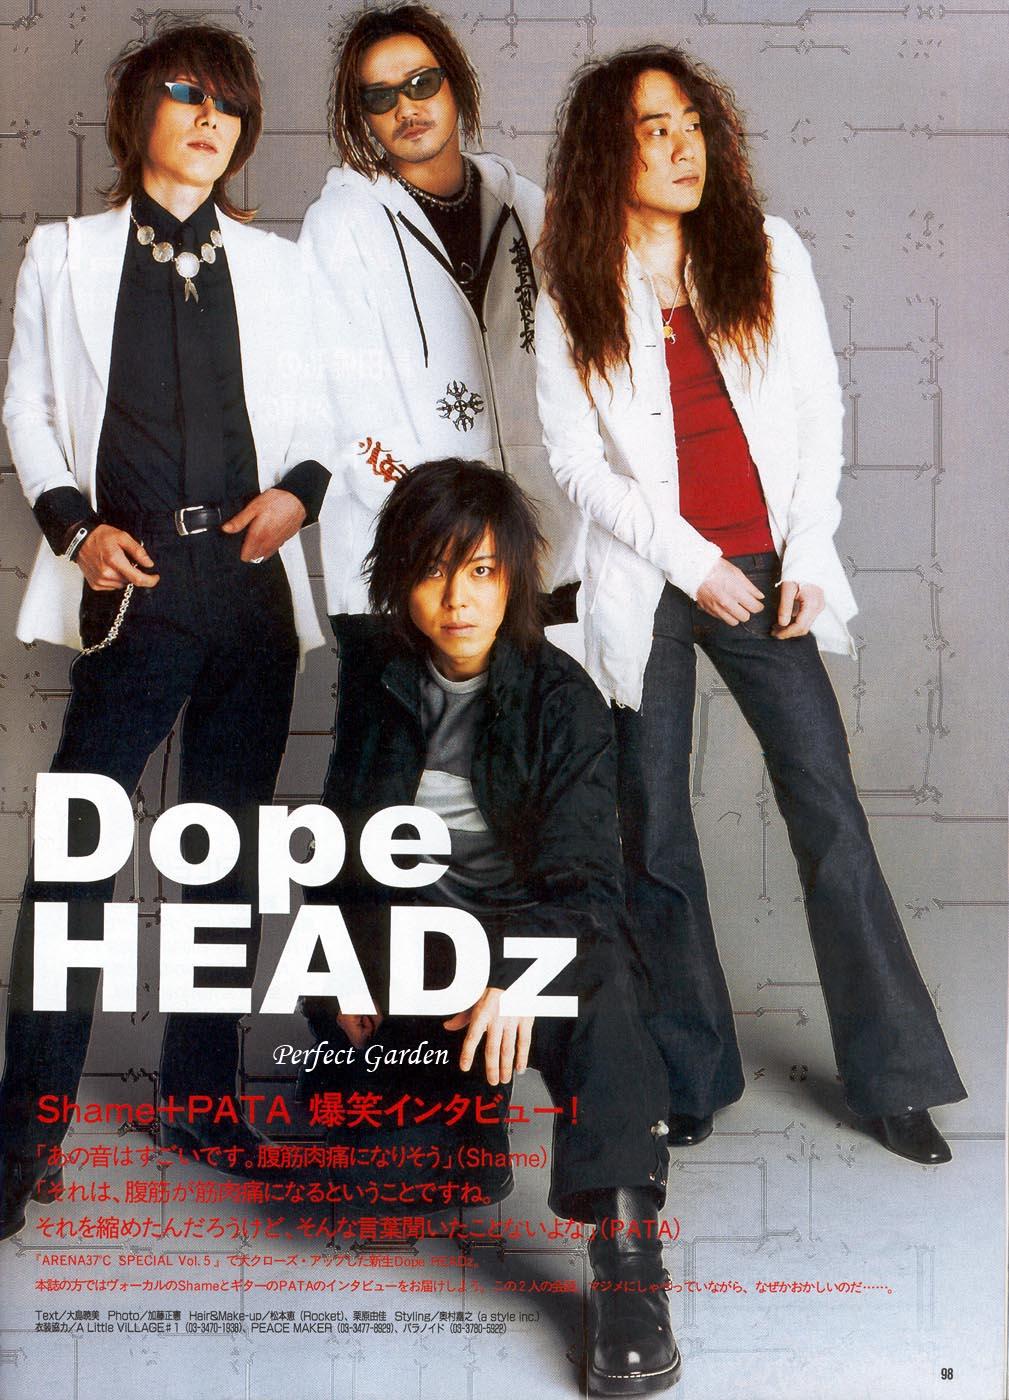 Dope HEADz - JapaneseClass.jp